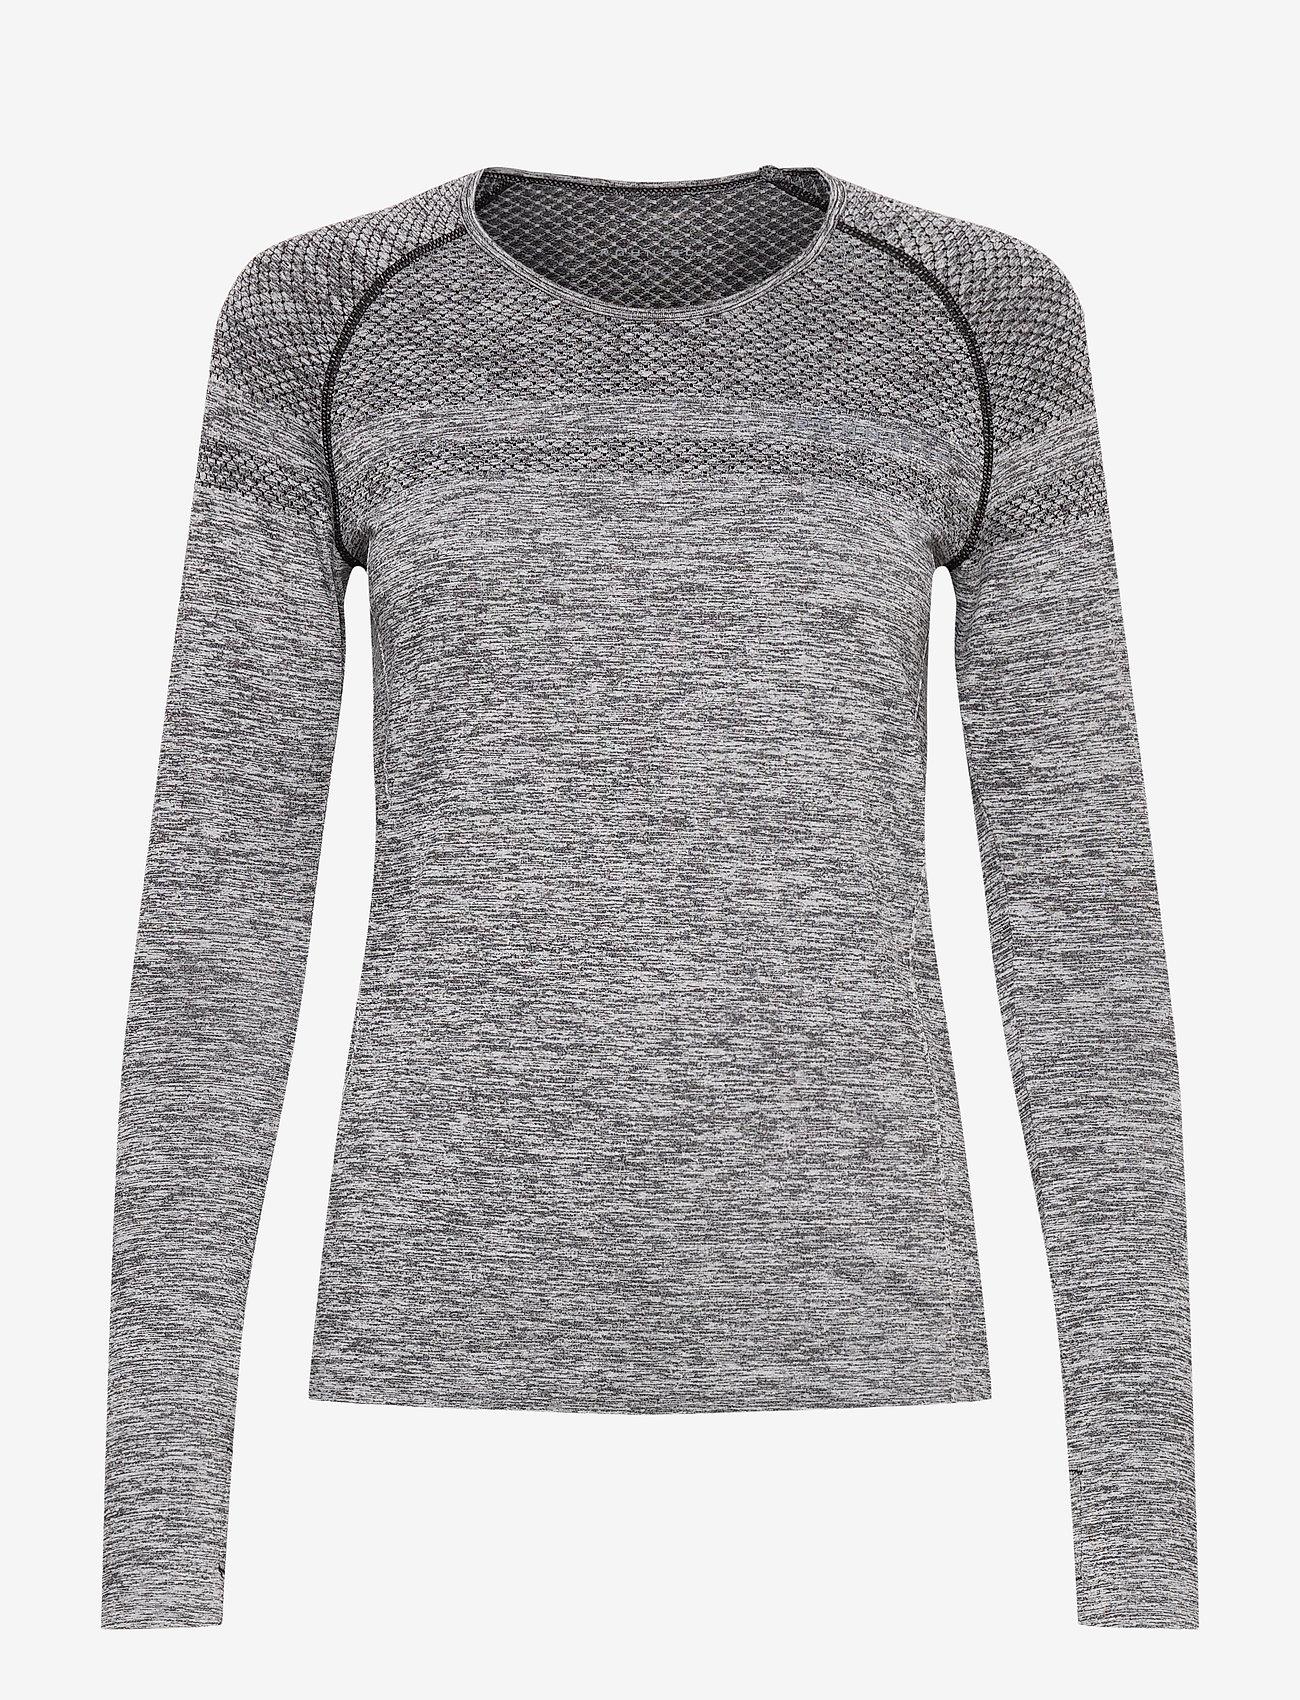 Röhnisch - Emma Seamless Long Sleeve - topjes met lange mouwen - grey melange - 0